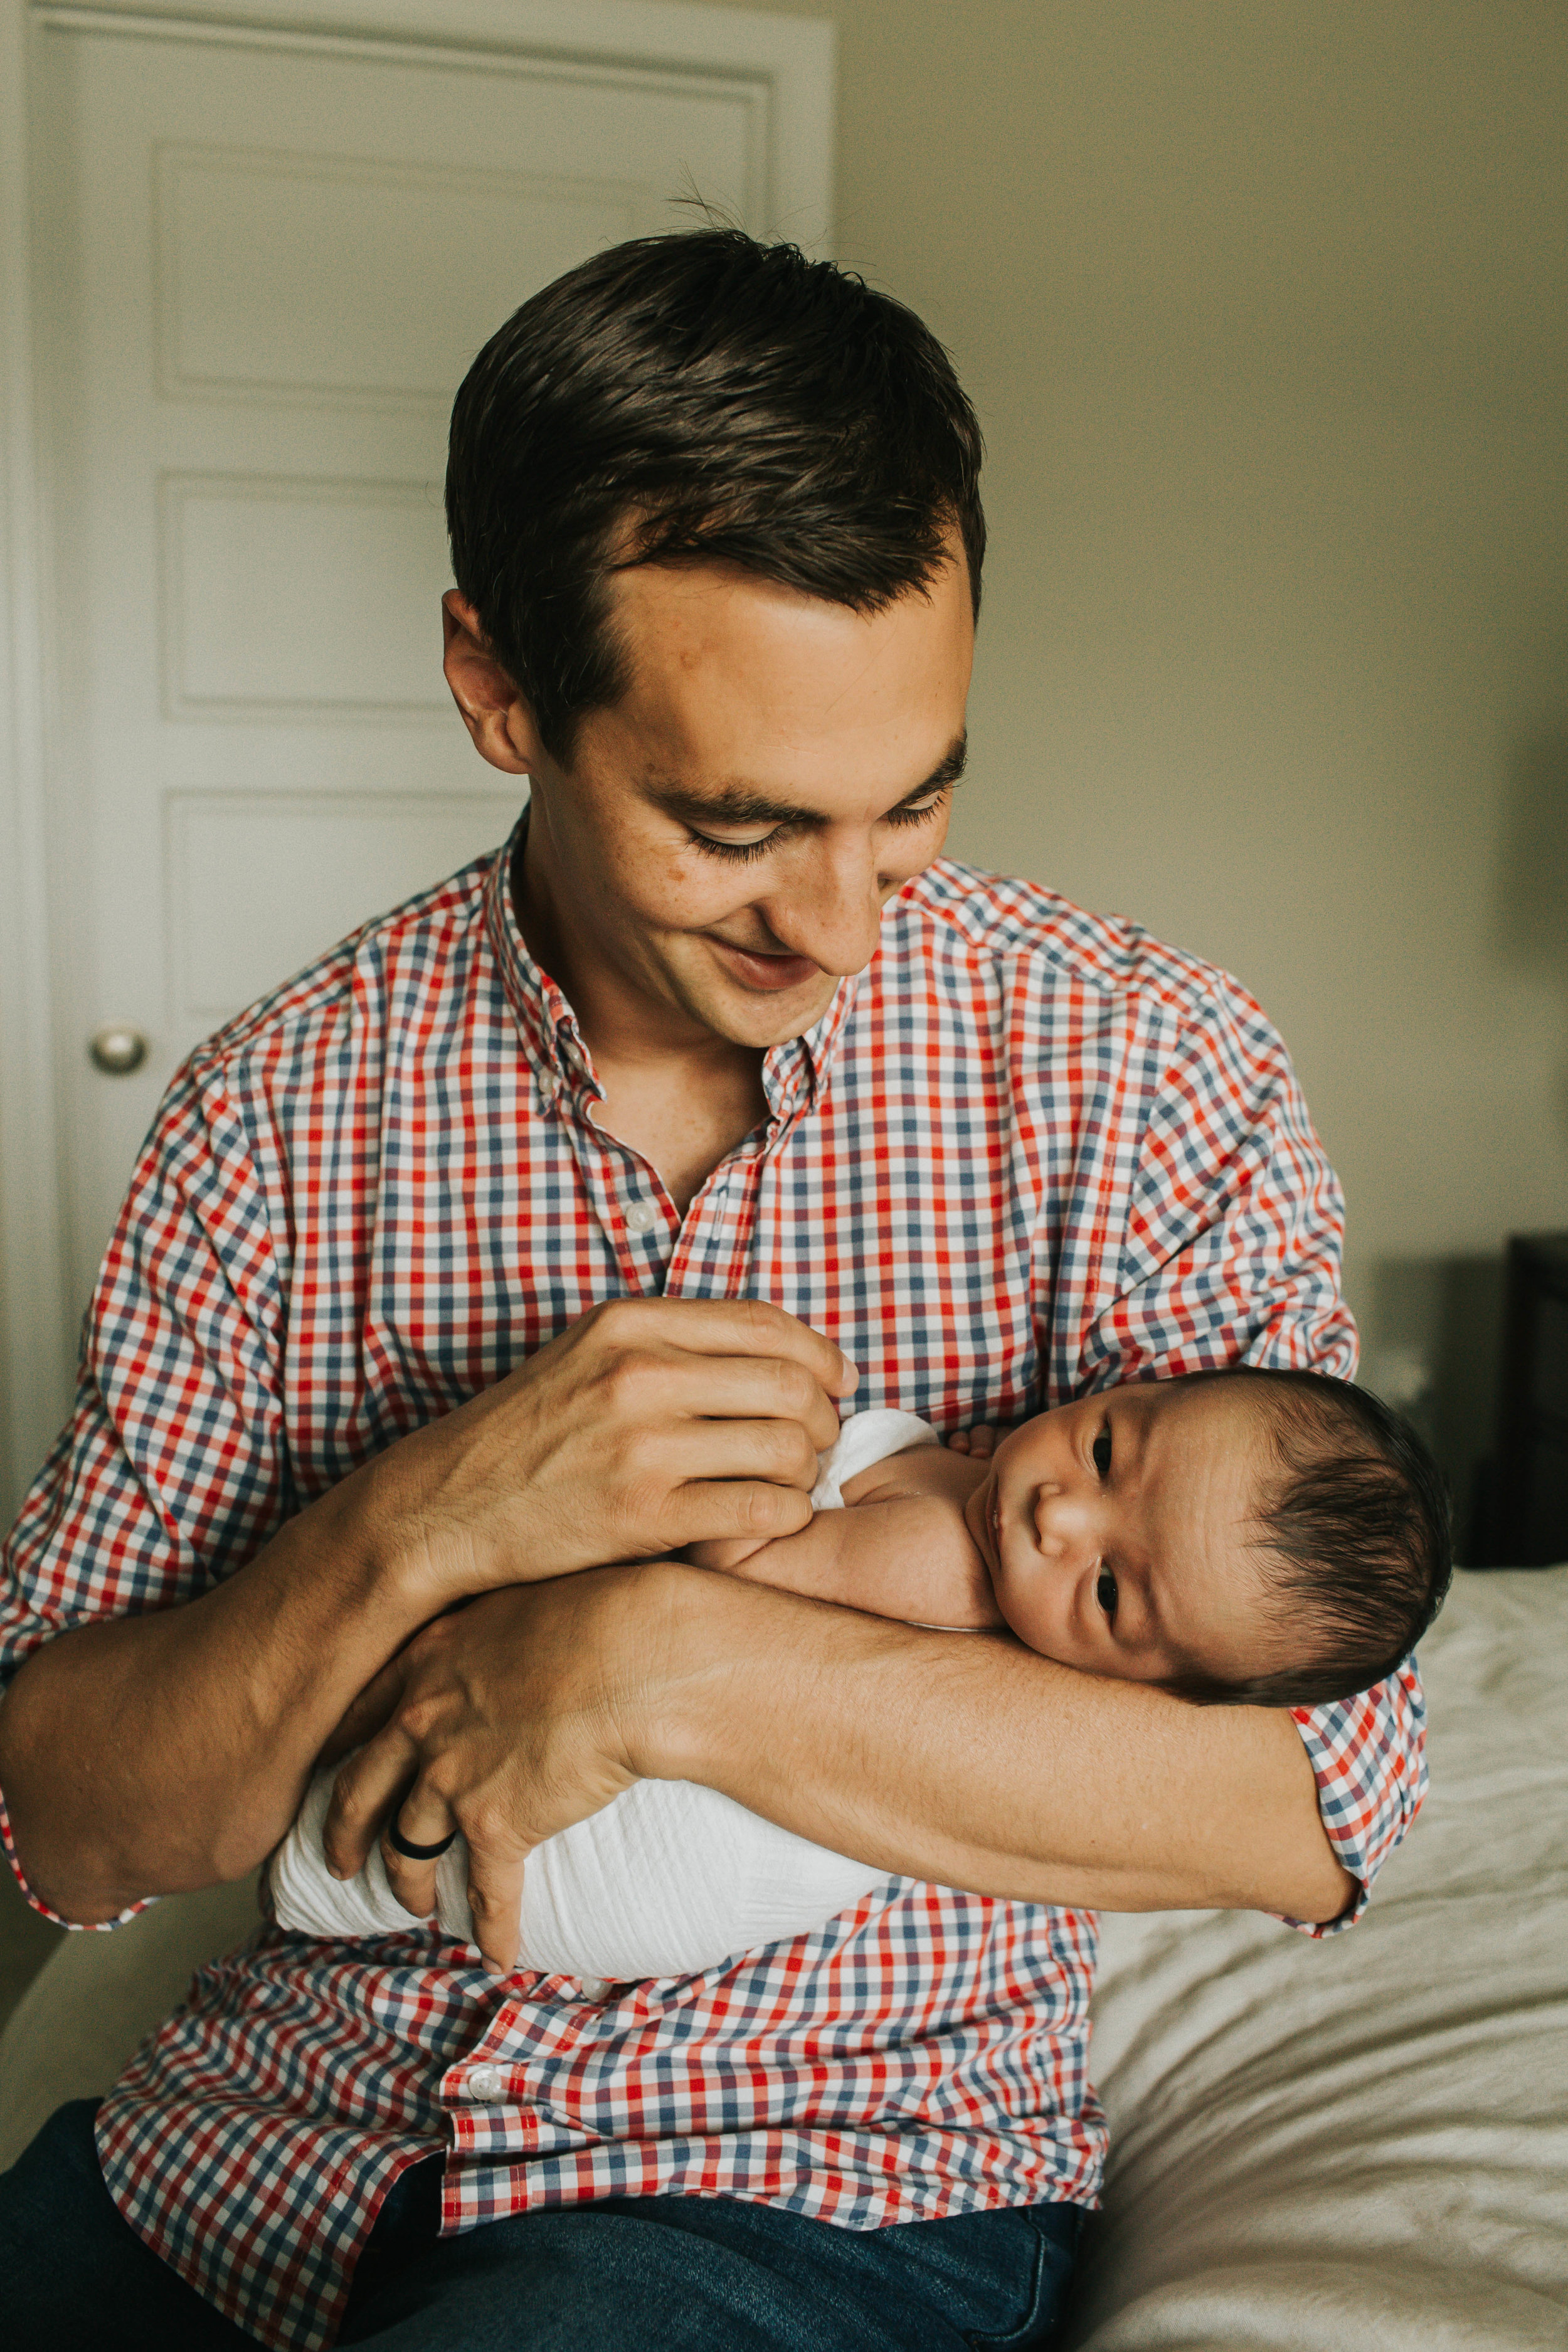 daddy holding baby  | Fairhope Newborn - Caitlen Babb Photography